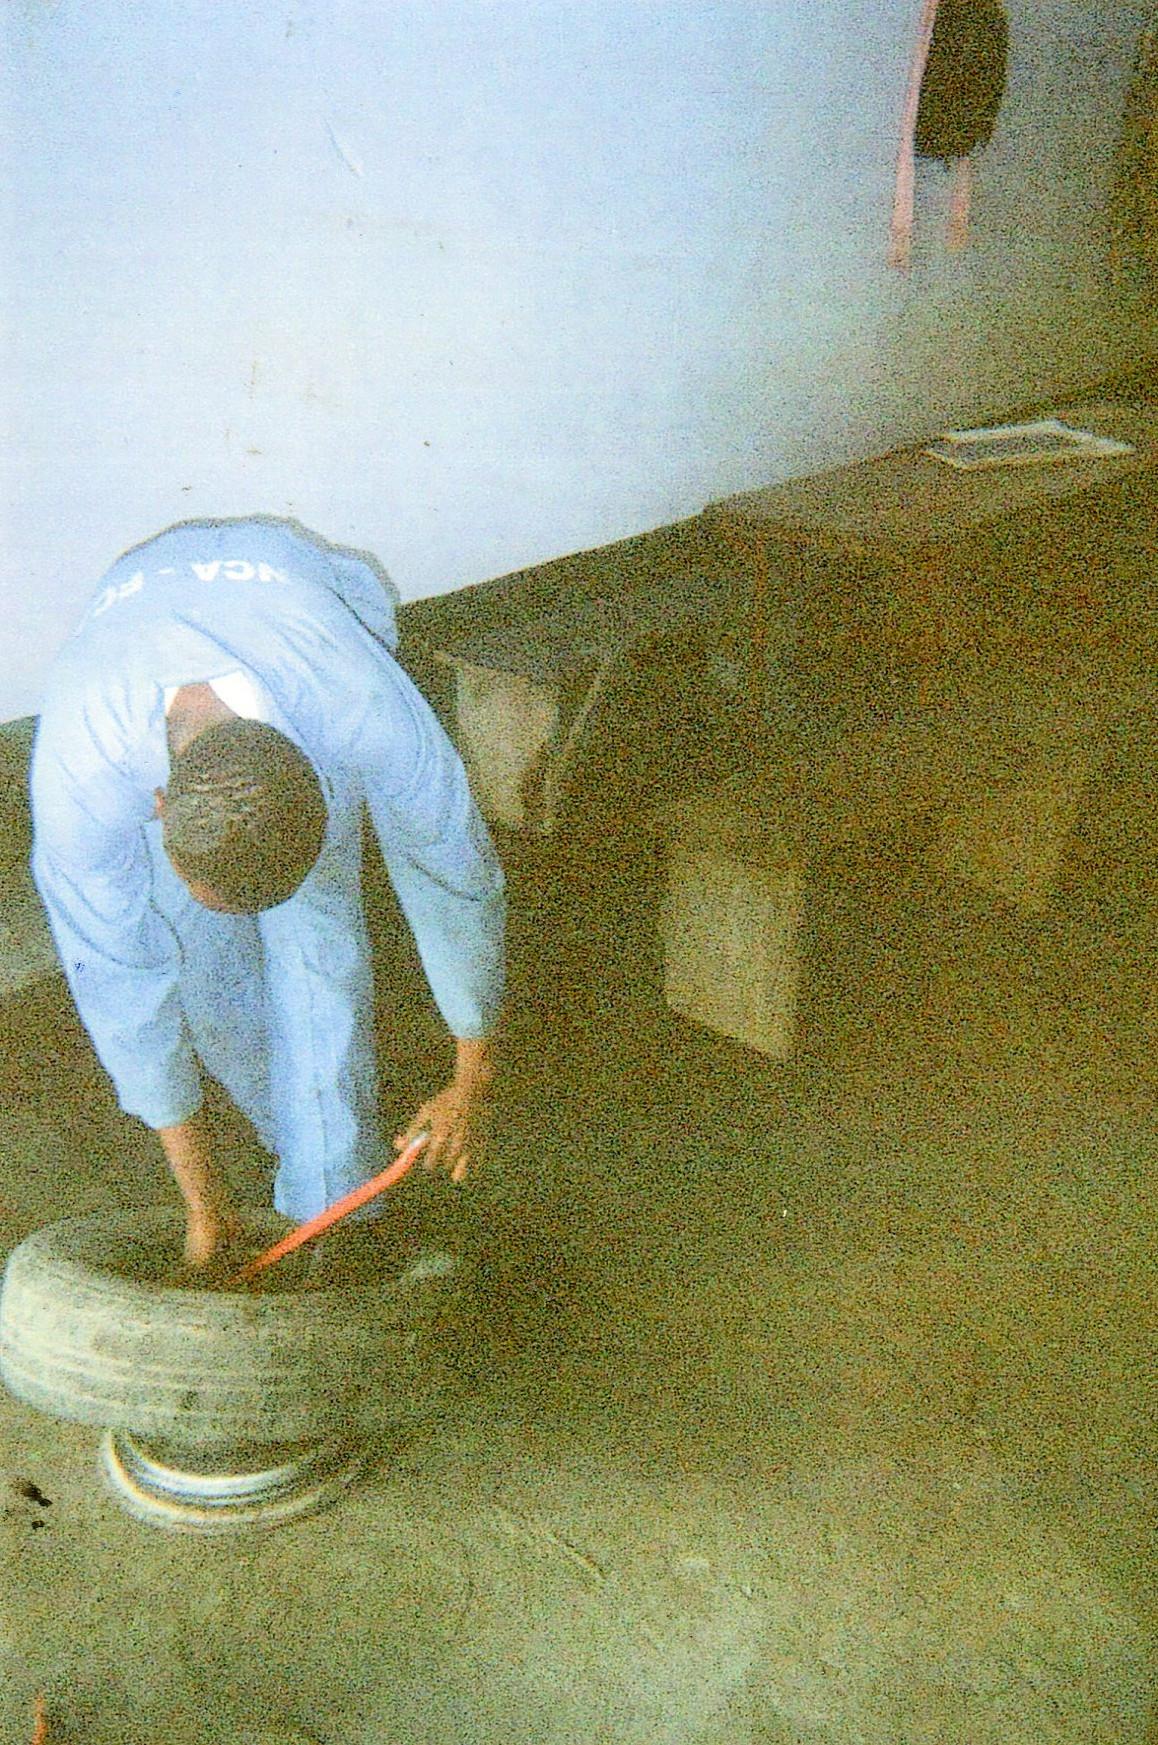 I am repairing a car tire.